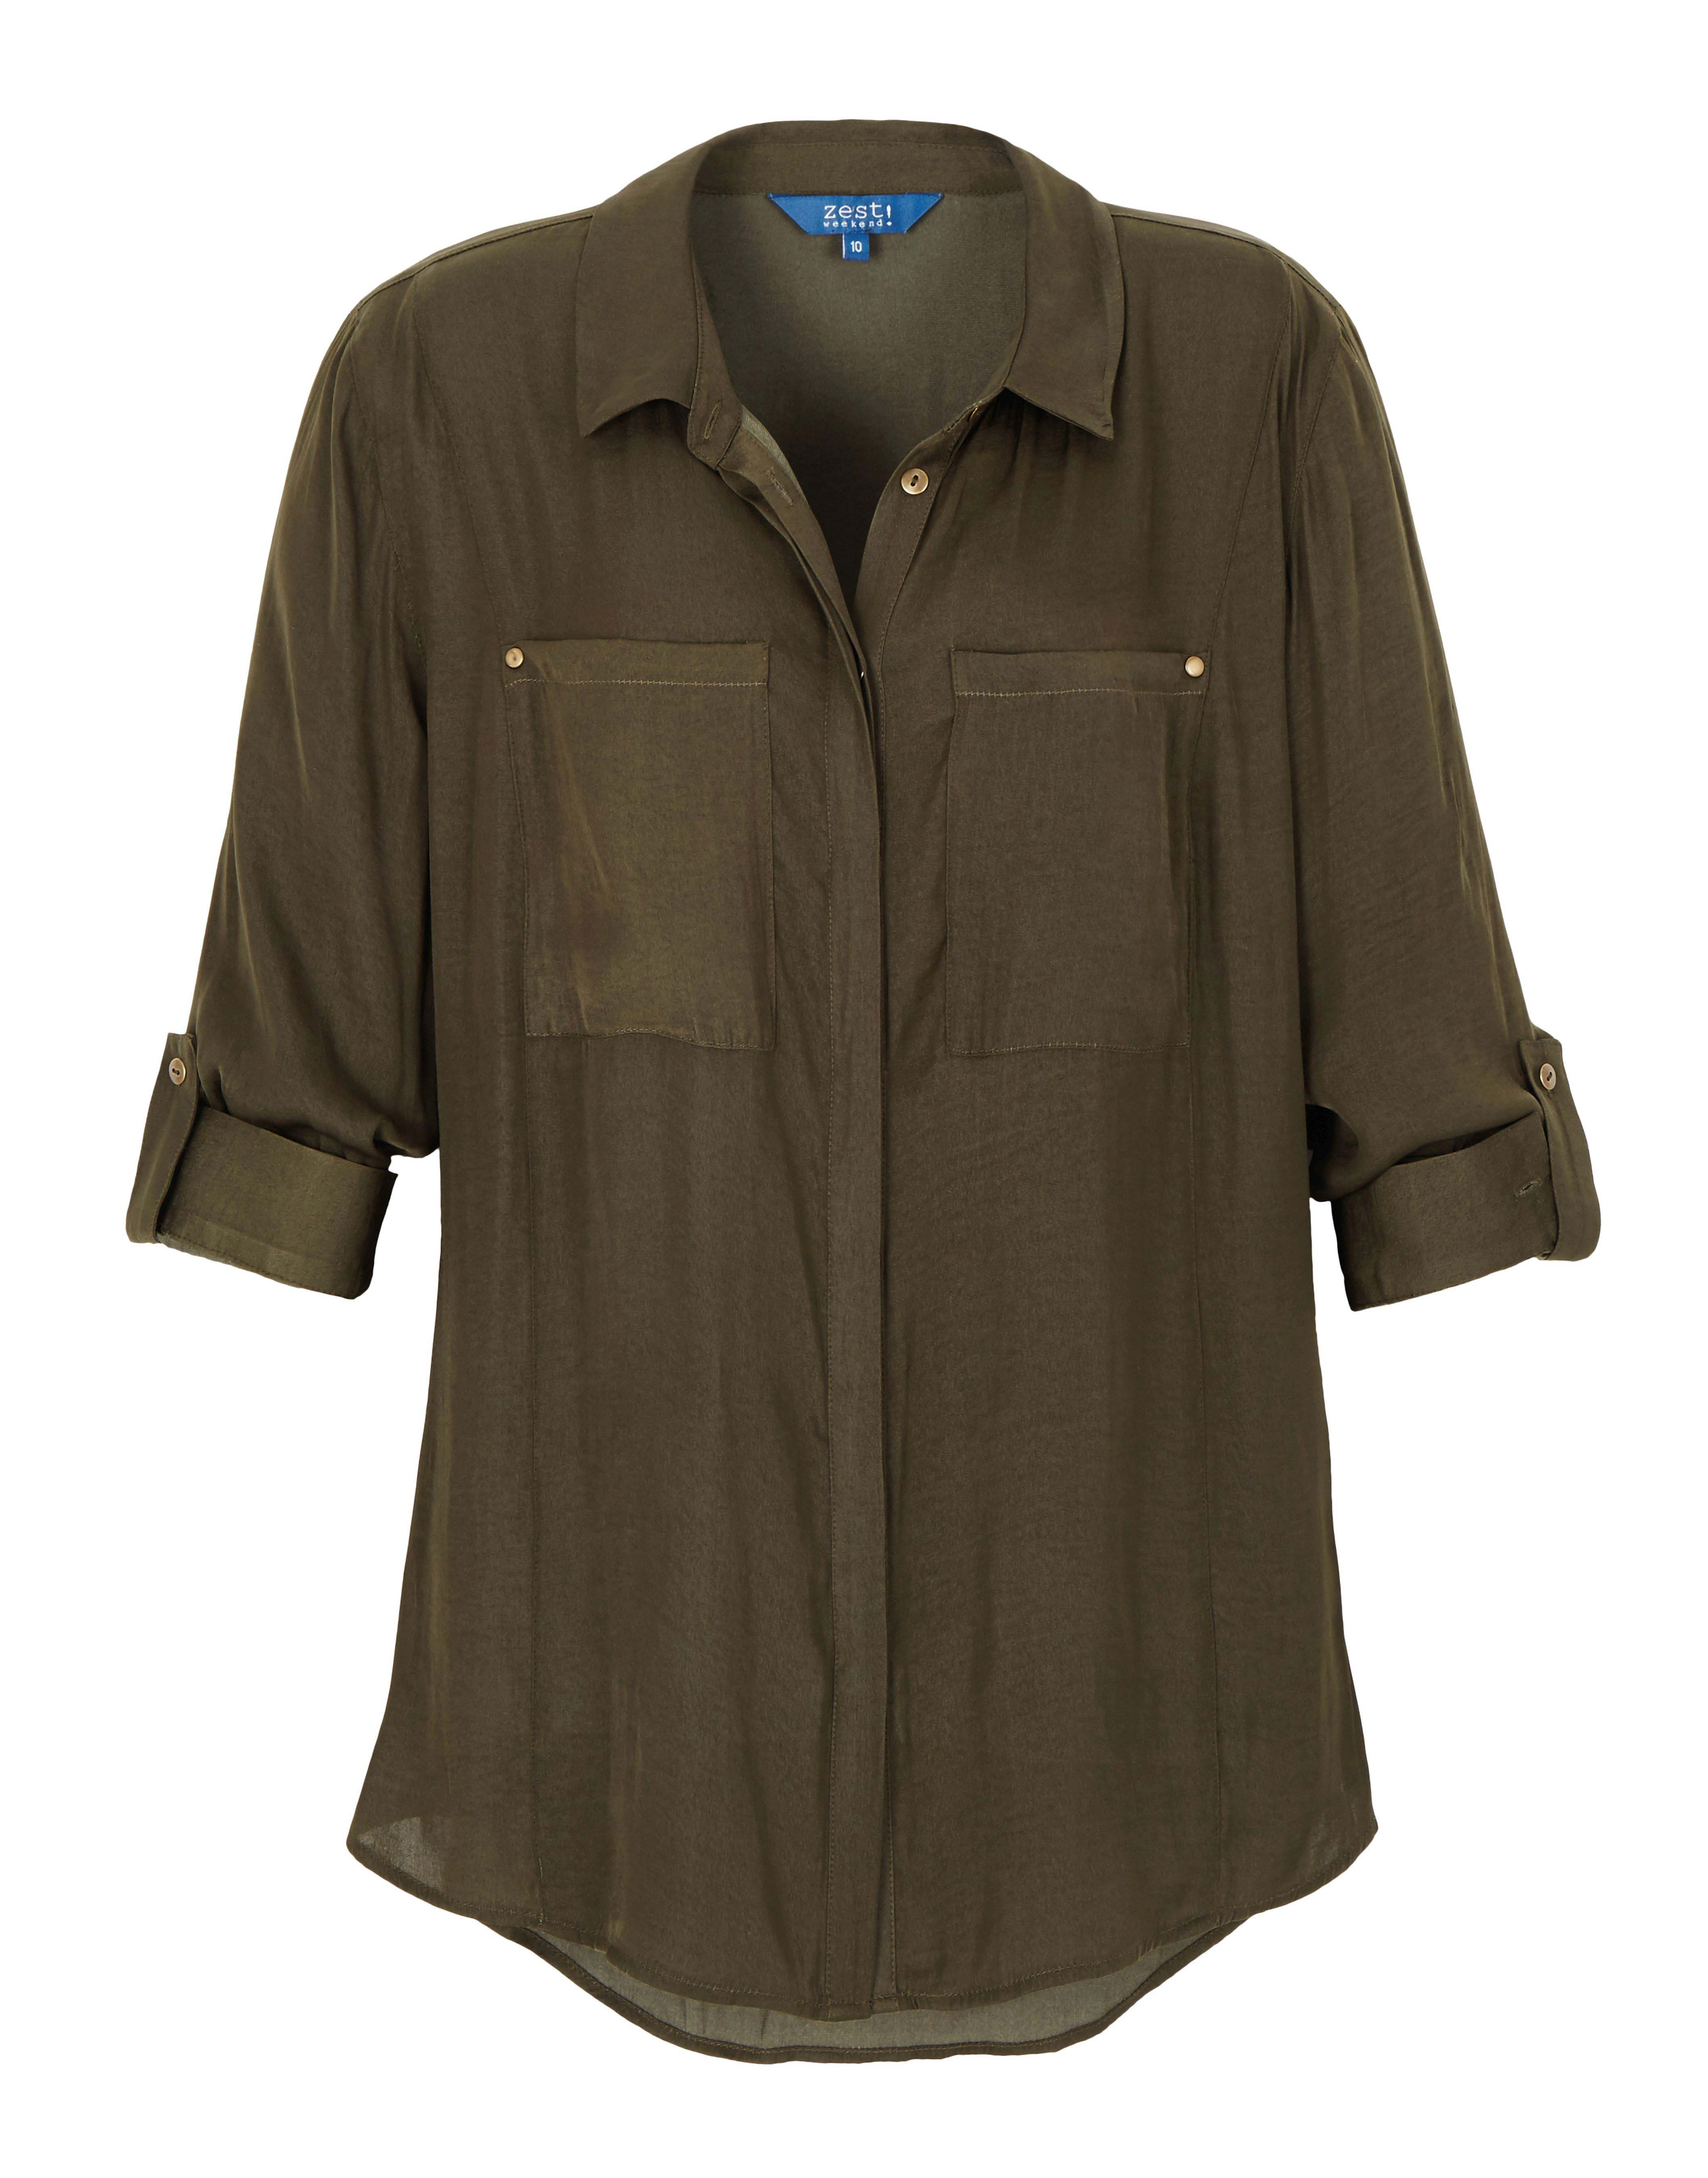 6085105 Zest Weekend Lobgline Peached Shirt Rolled Sleeve $59.99 Feb 18 2016